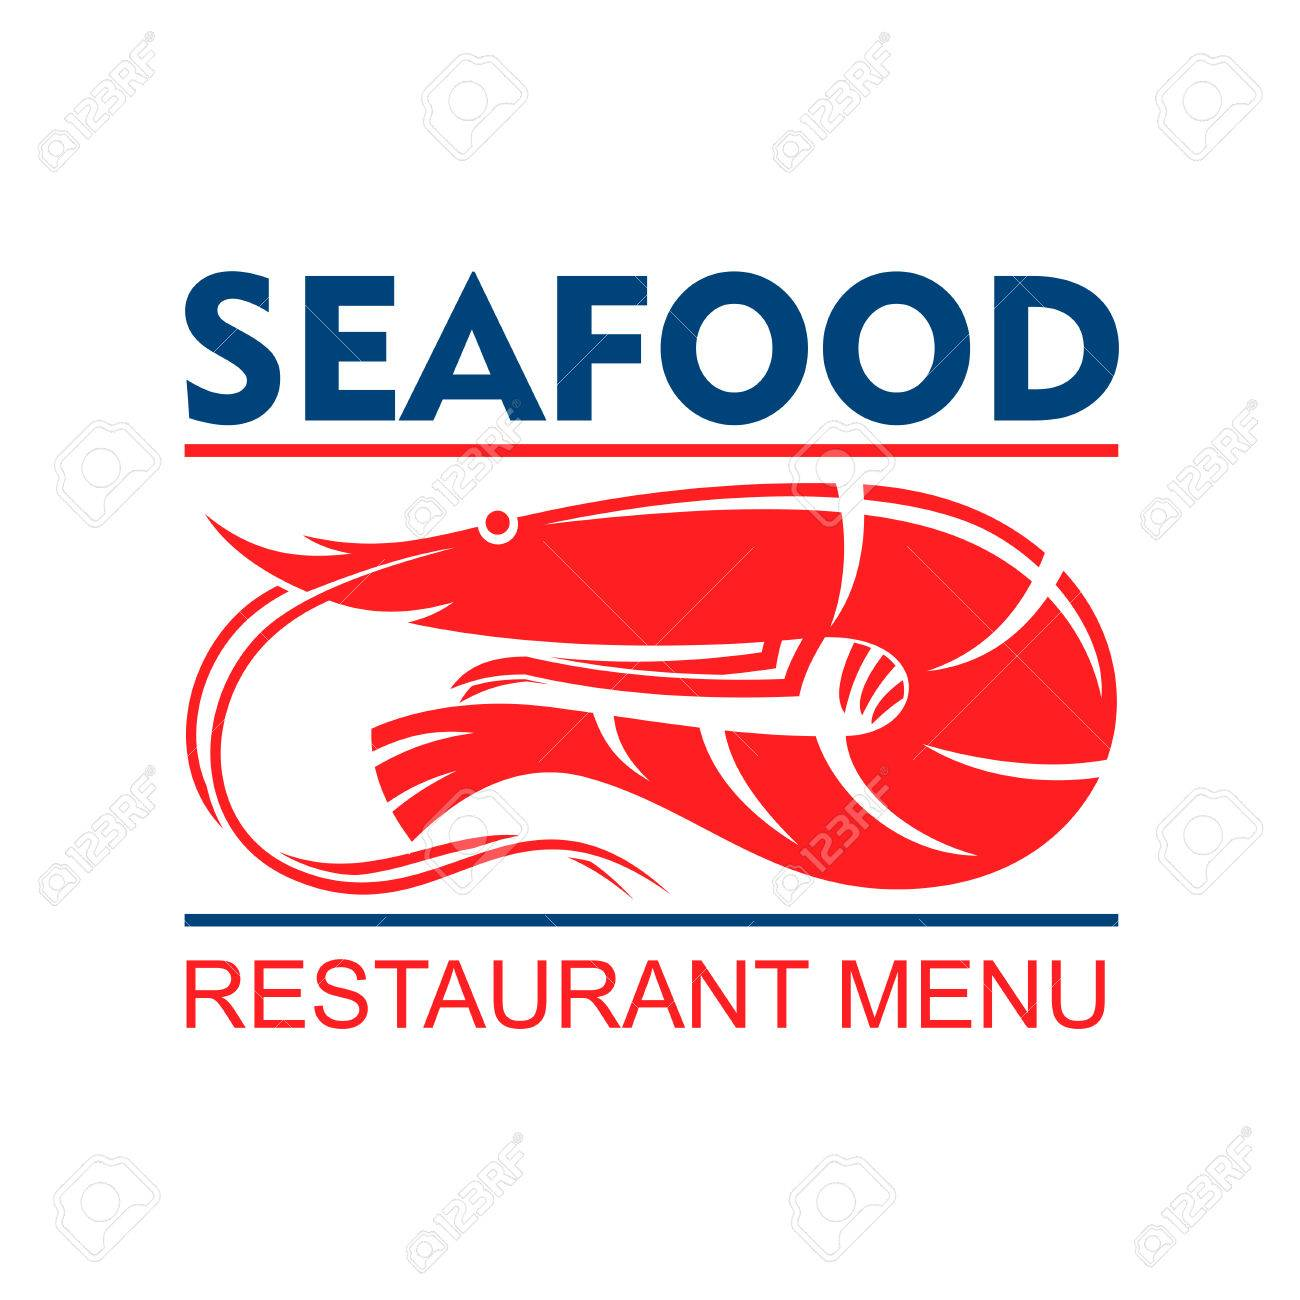 Seafood Restaurant Menu Badge Design Template With Marine Red